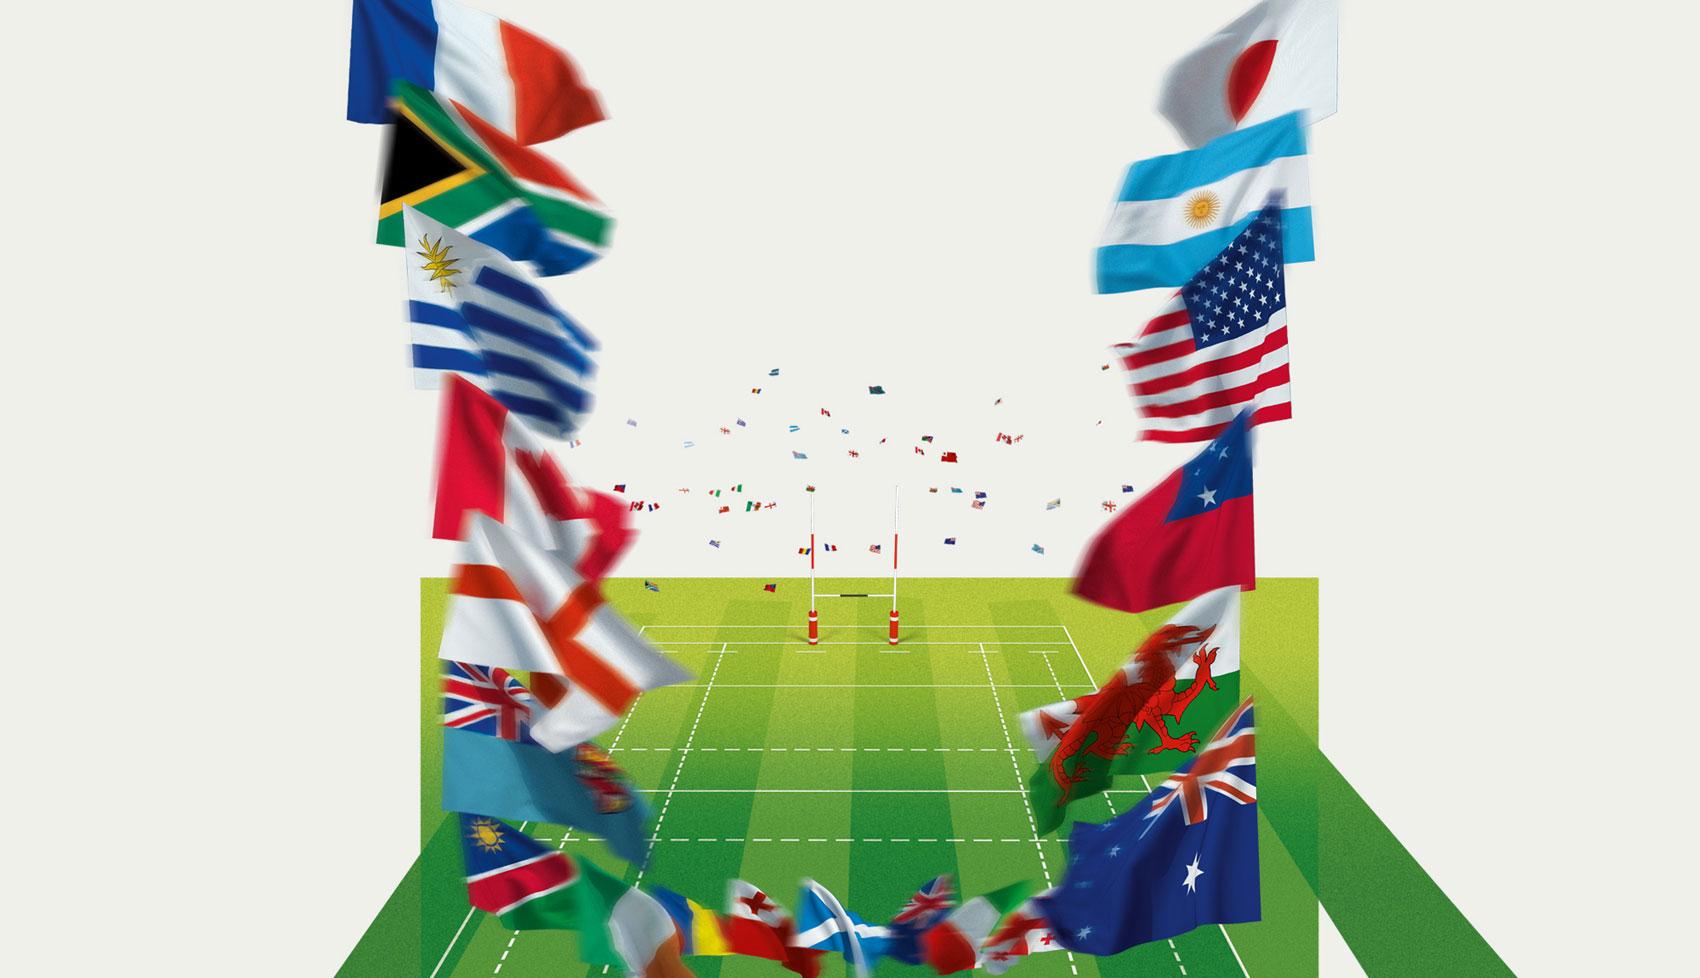 carlsberg-rugby-3